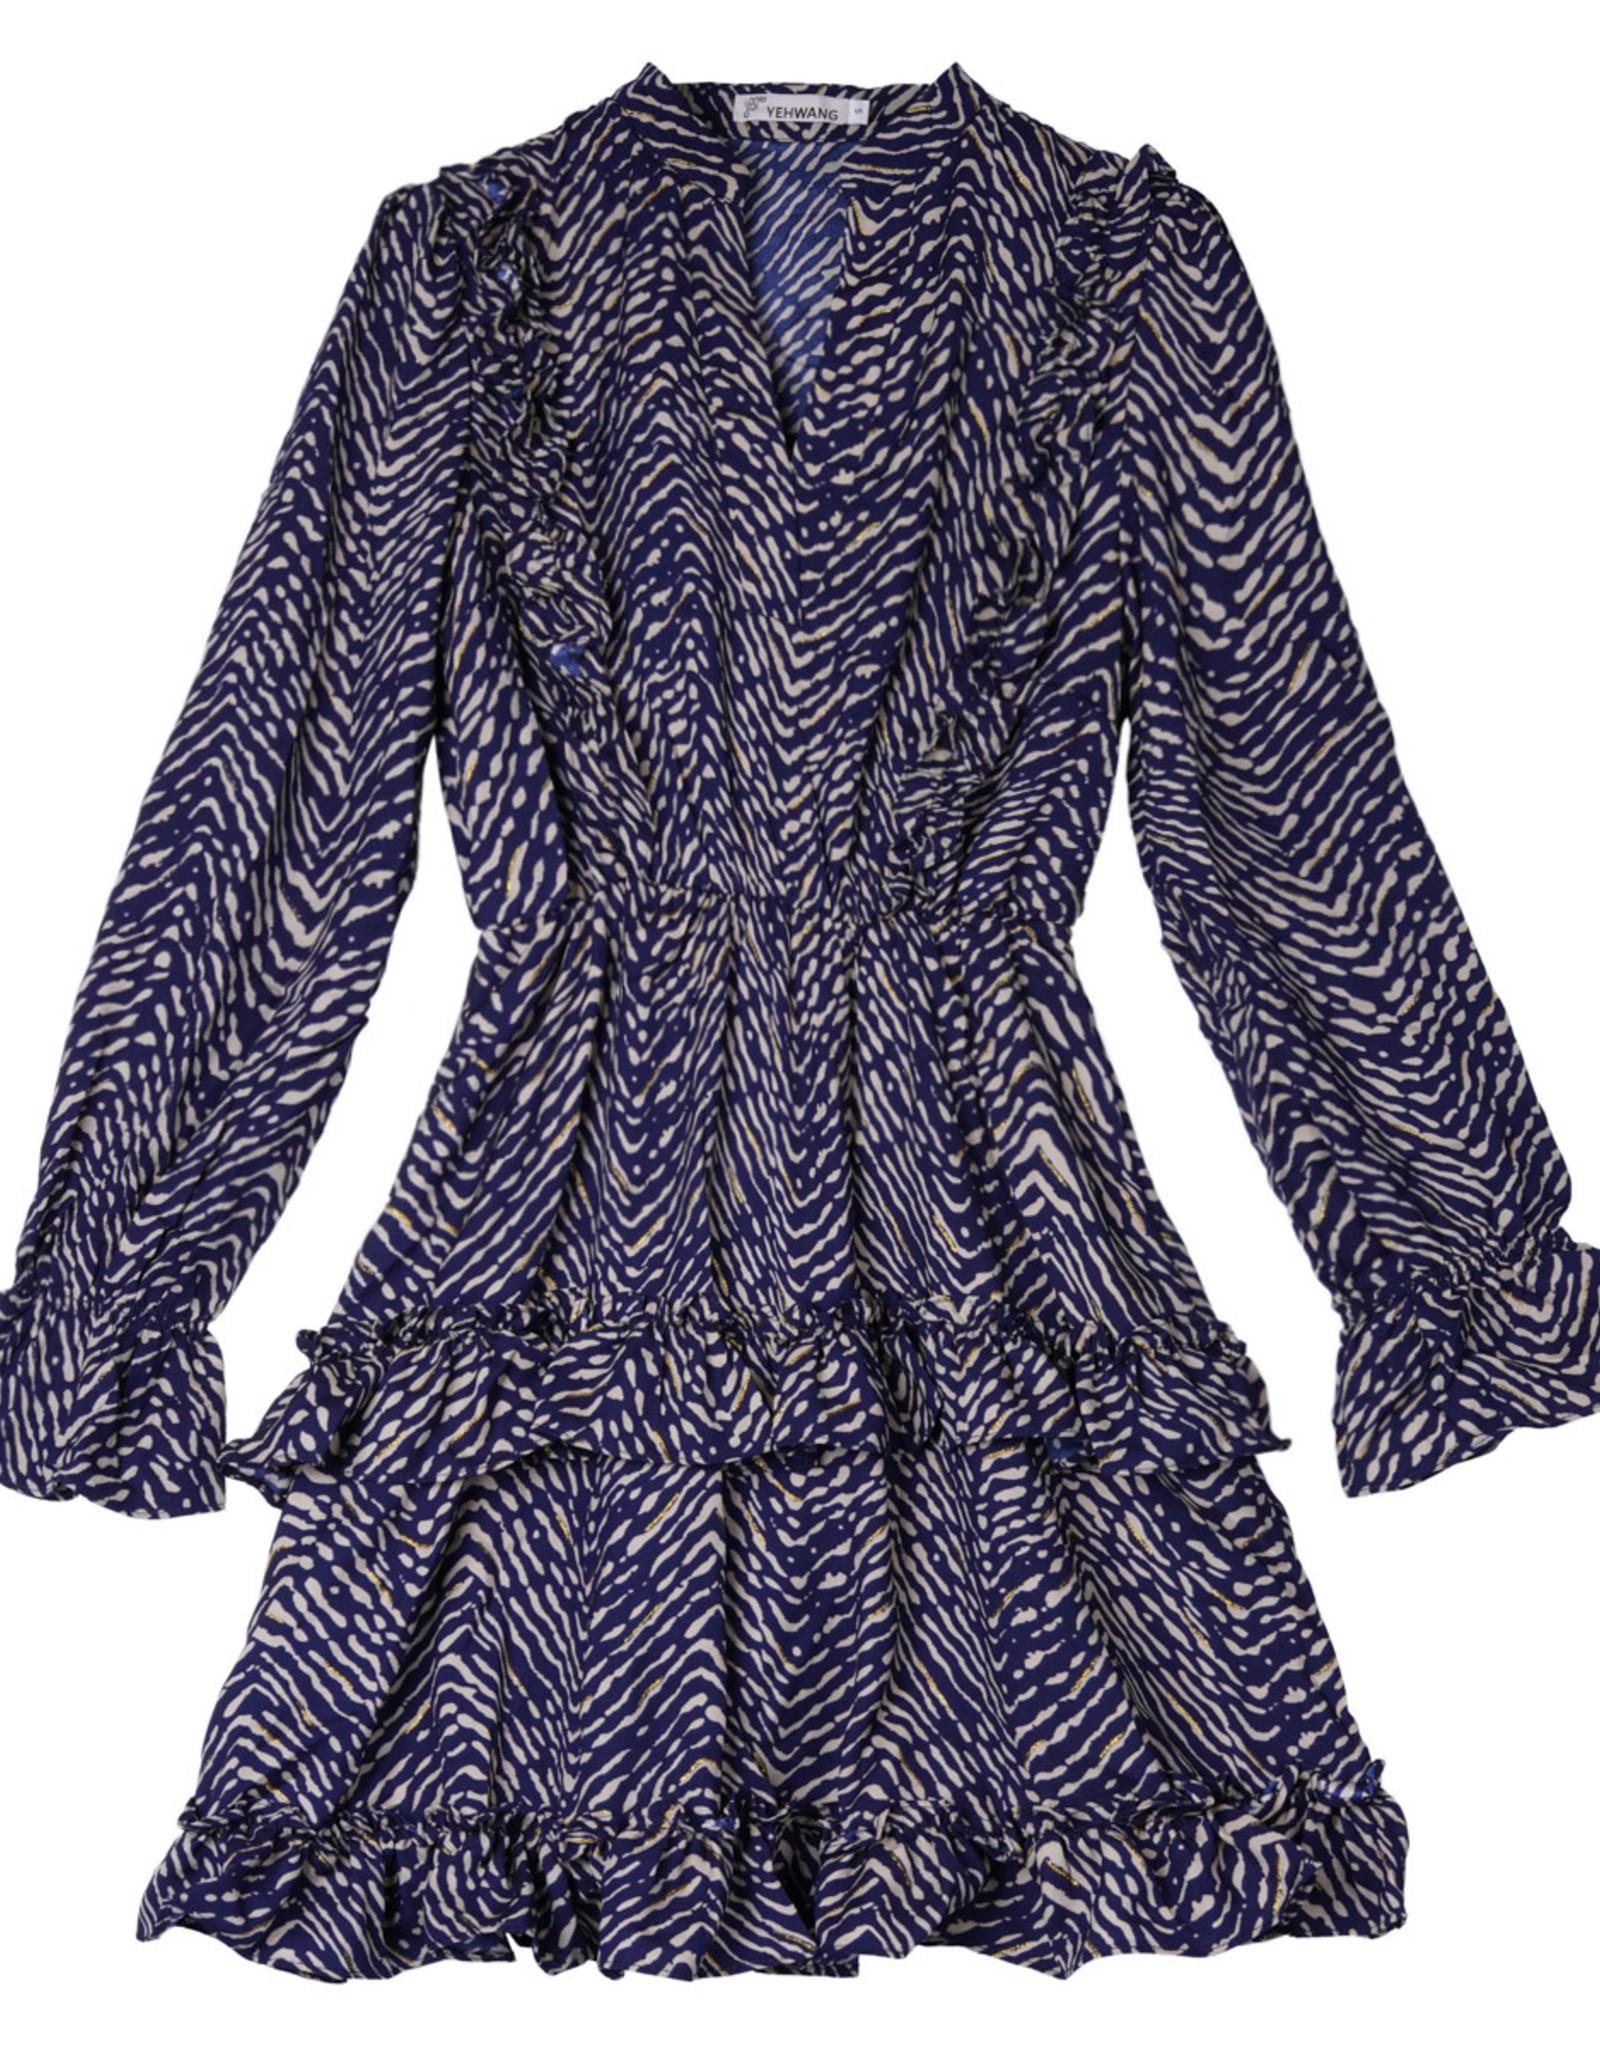 Dress - blue stripes